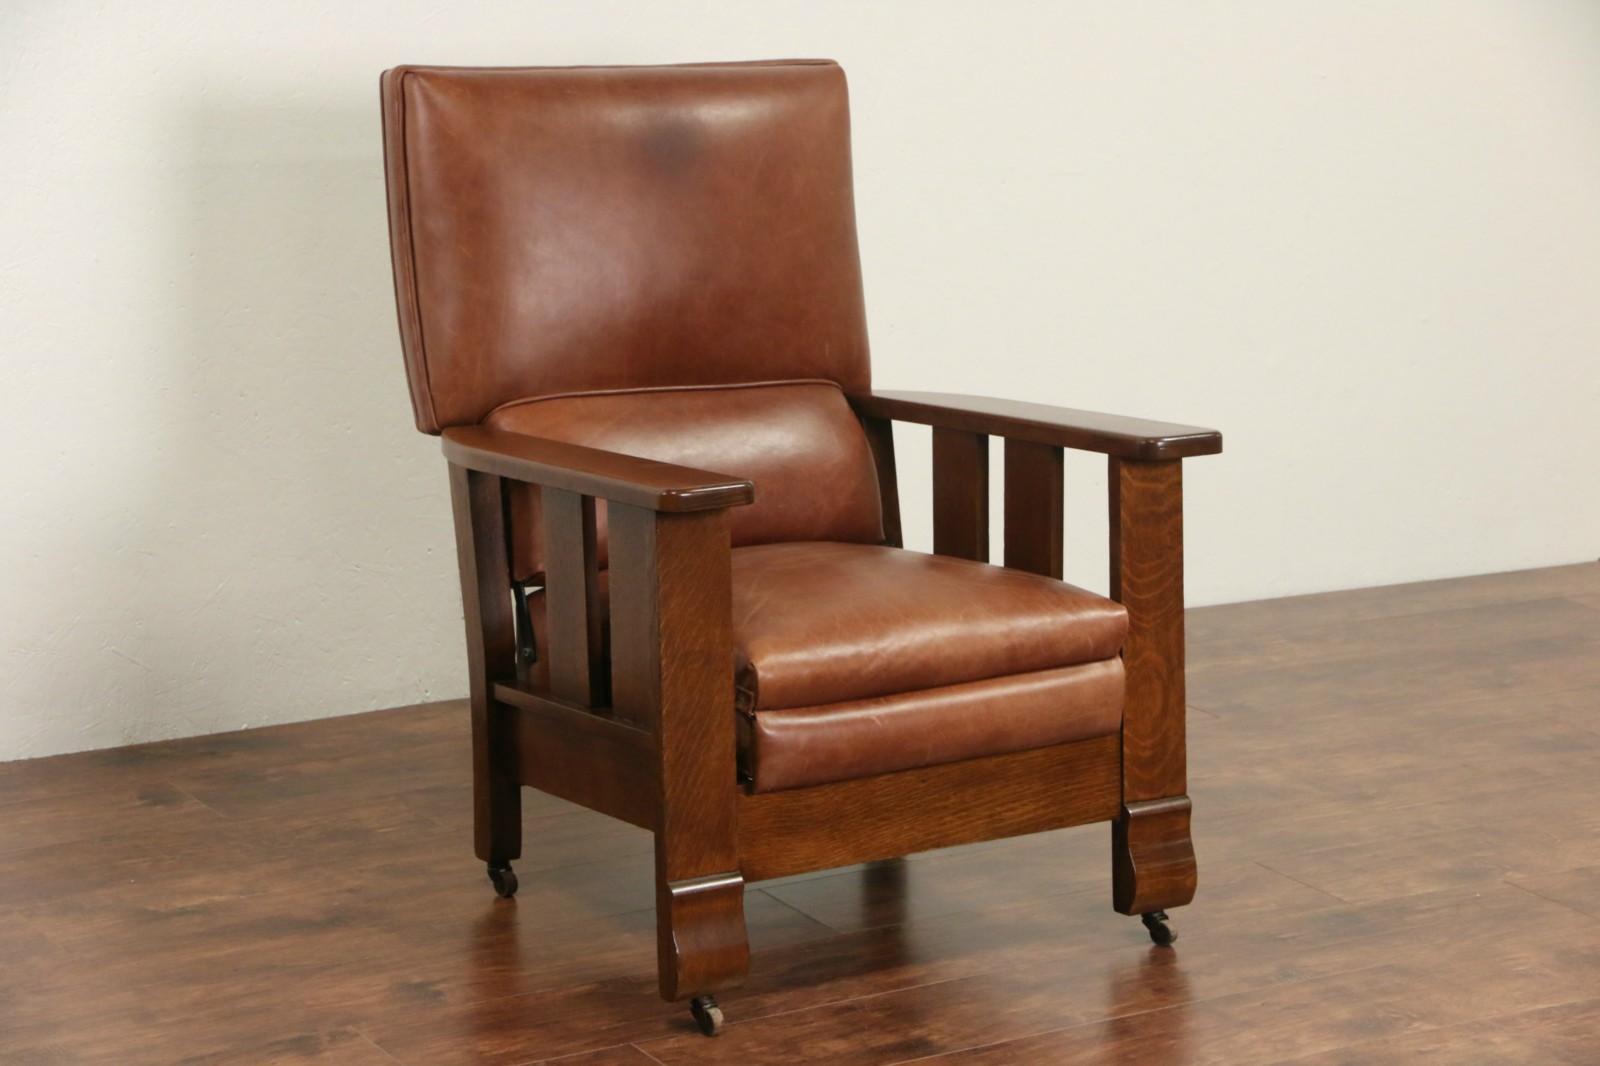 Antique mission chair - Arts Crafts Mission Oak 1920 Antique Leather Morris Recliner Chair